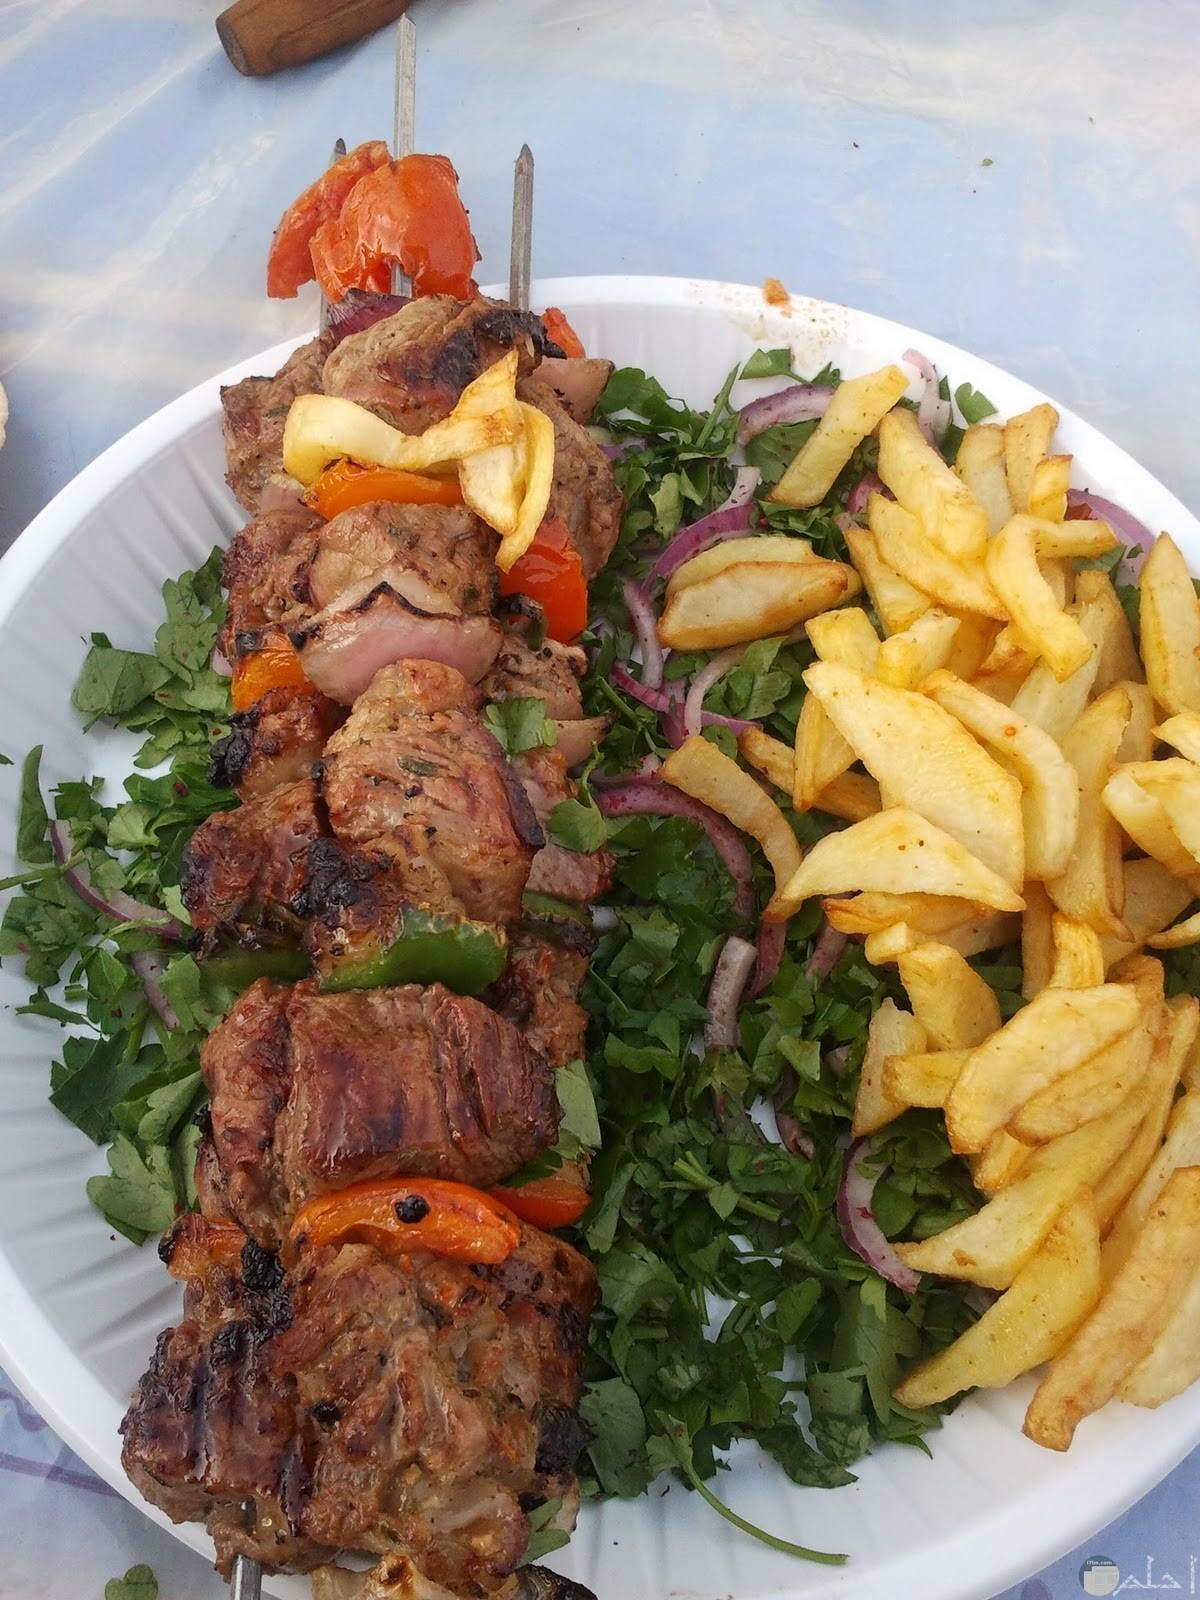 كباب مشوي مع سلطة بطاطس وخضراوات